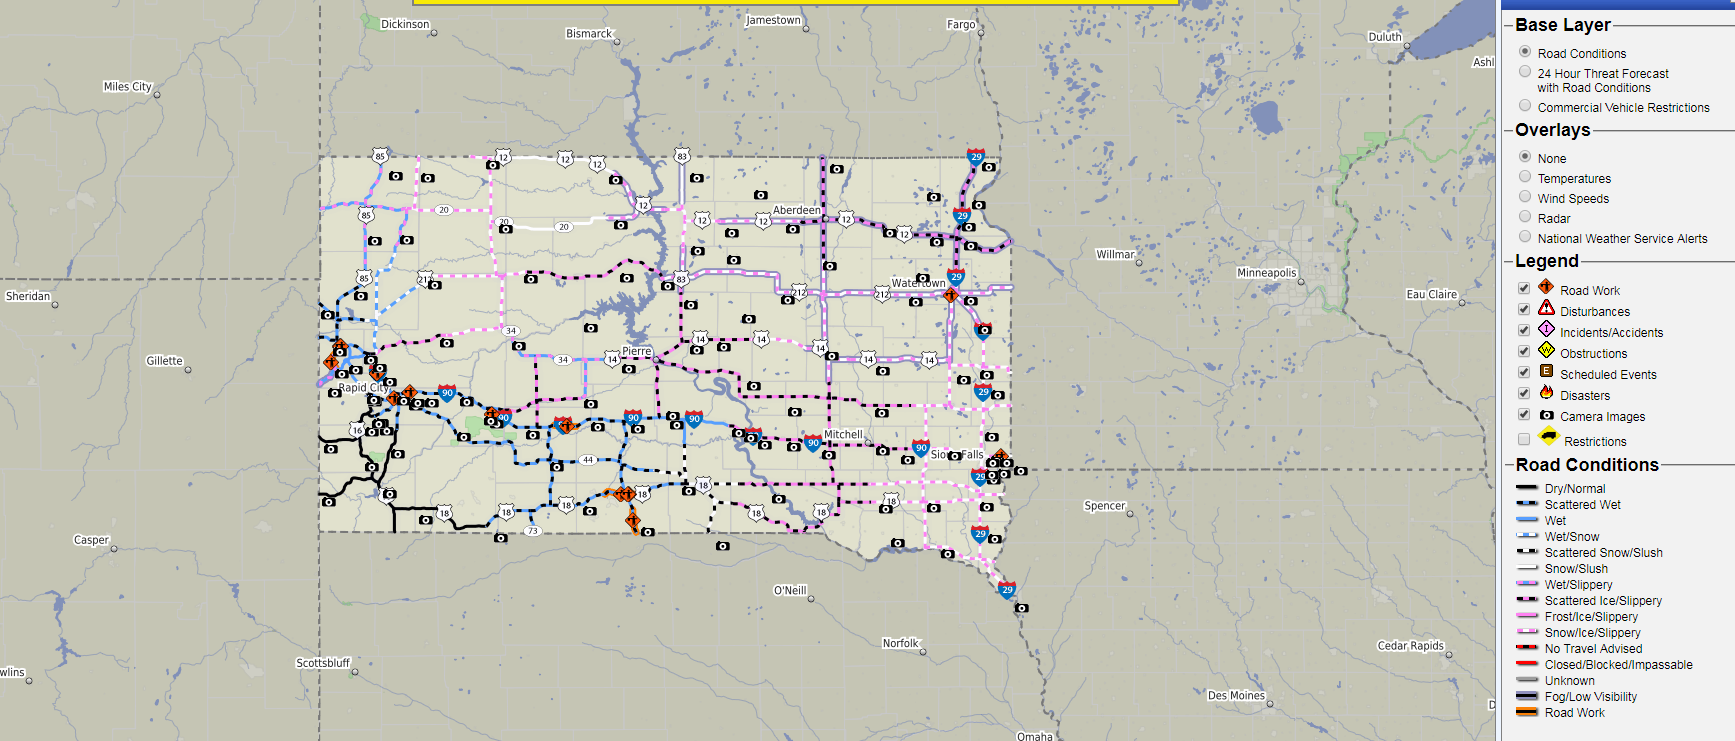 Road Conditions Across South Dakota